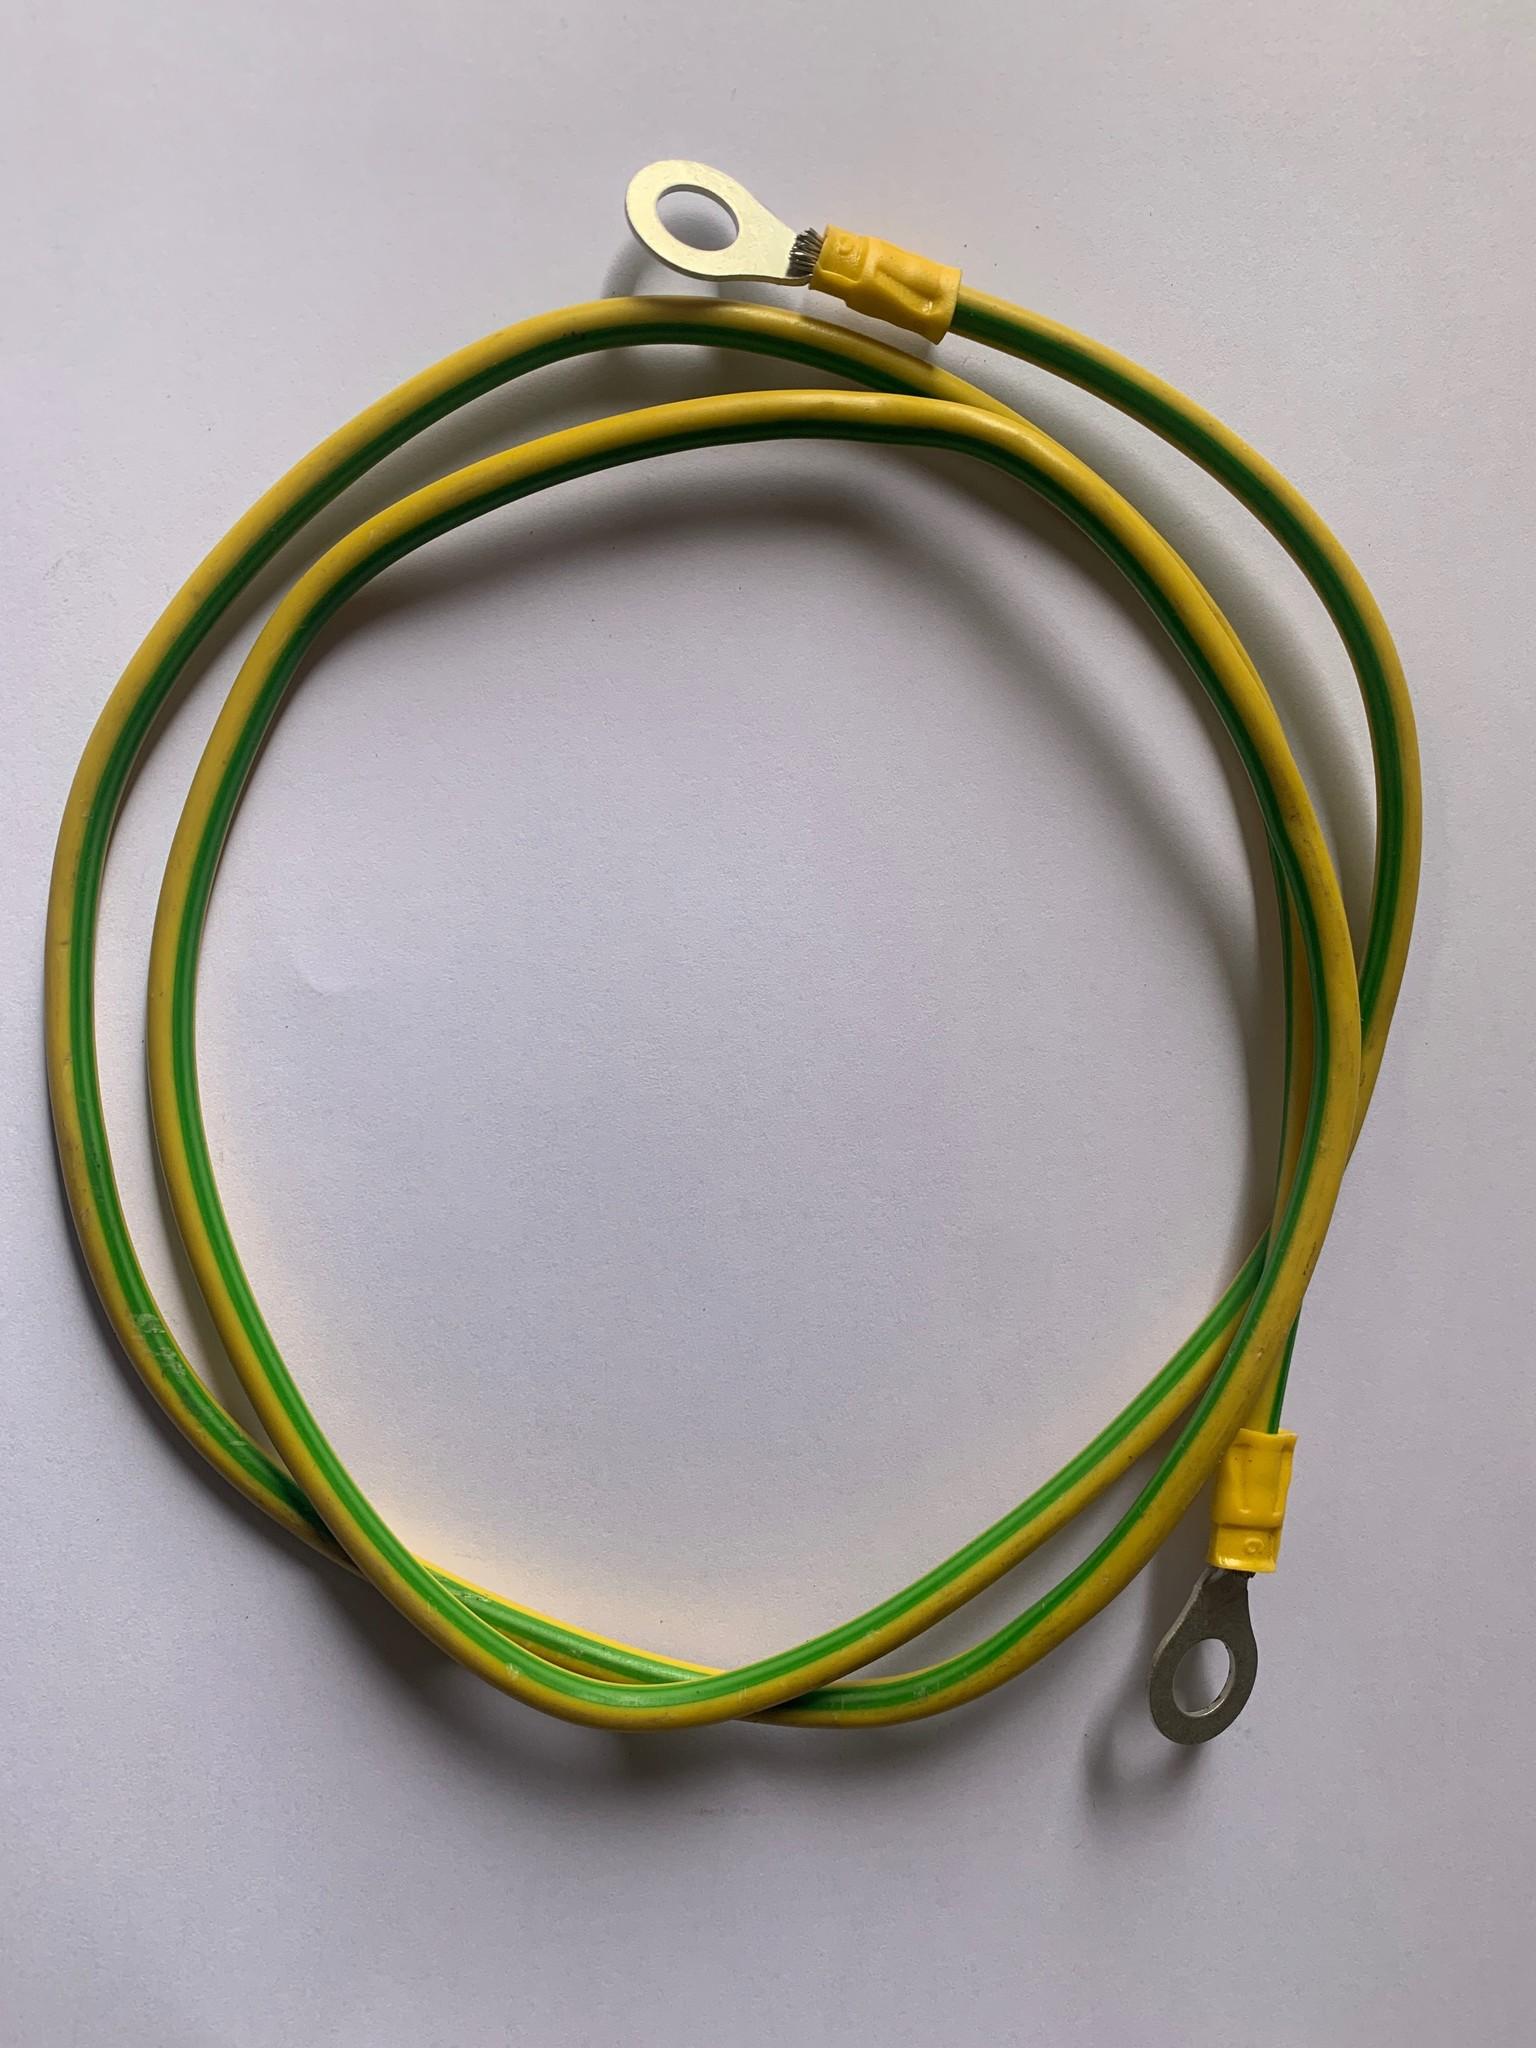 Aarde kabel Aardekabel 7 meter + M8 oogschoenen